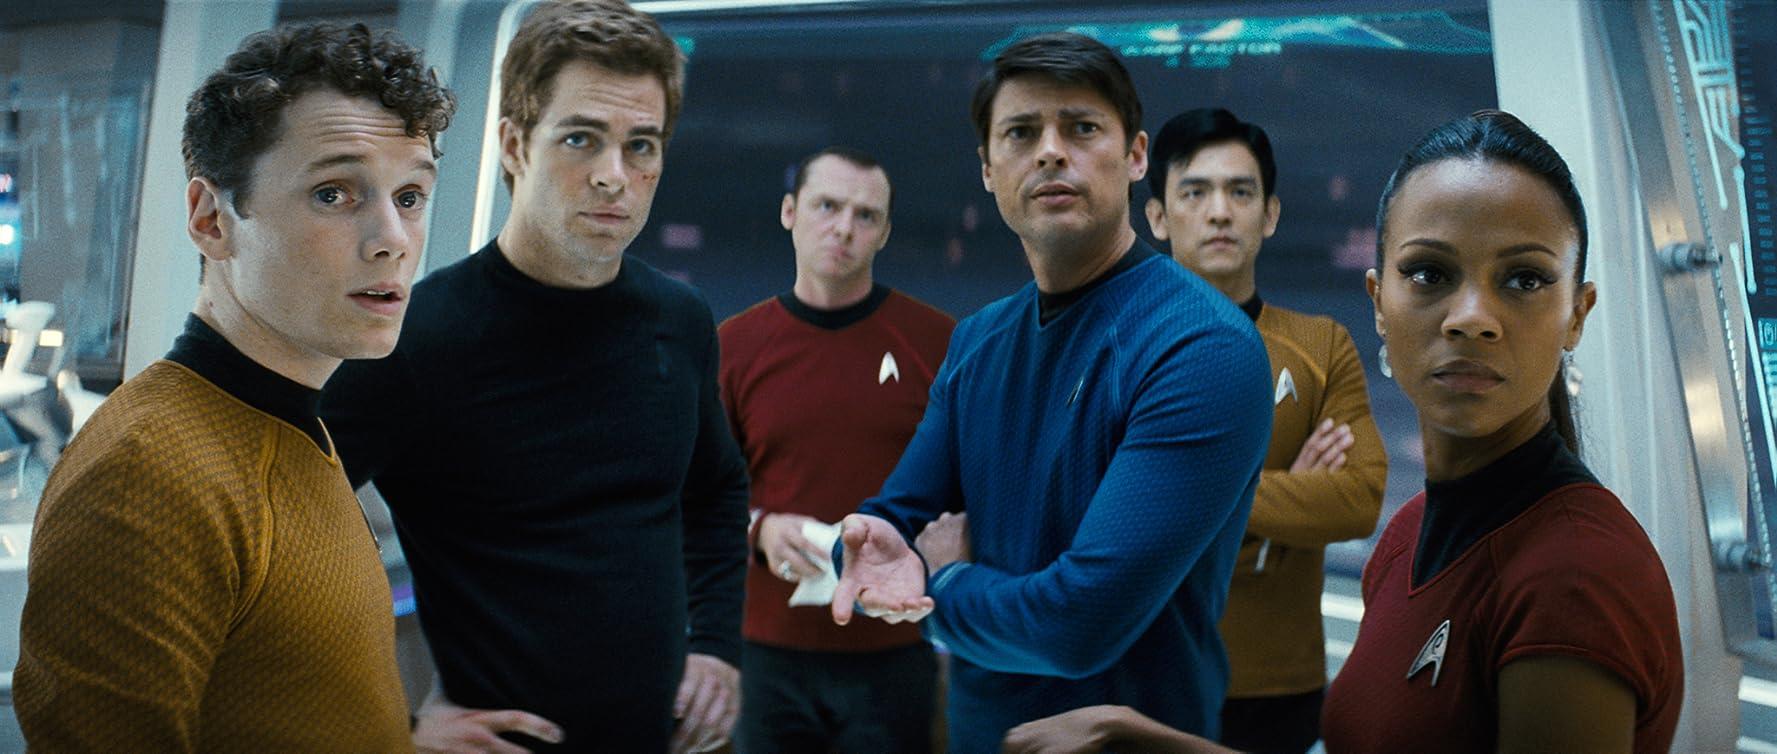 John Cho, Simon Pegg, Zoe Saldana, Karl Urban, Anton Yelchin, and Chris Pine in Star Trek (2009)